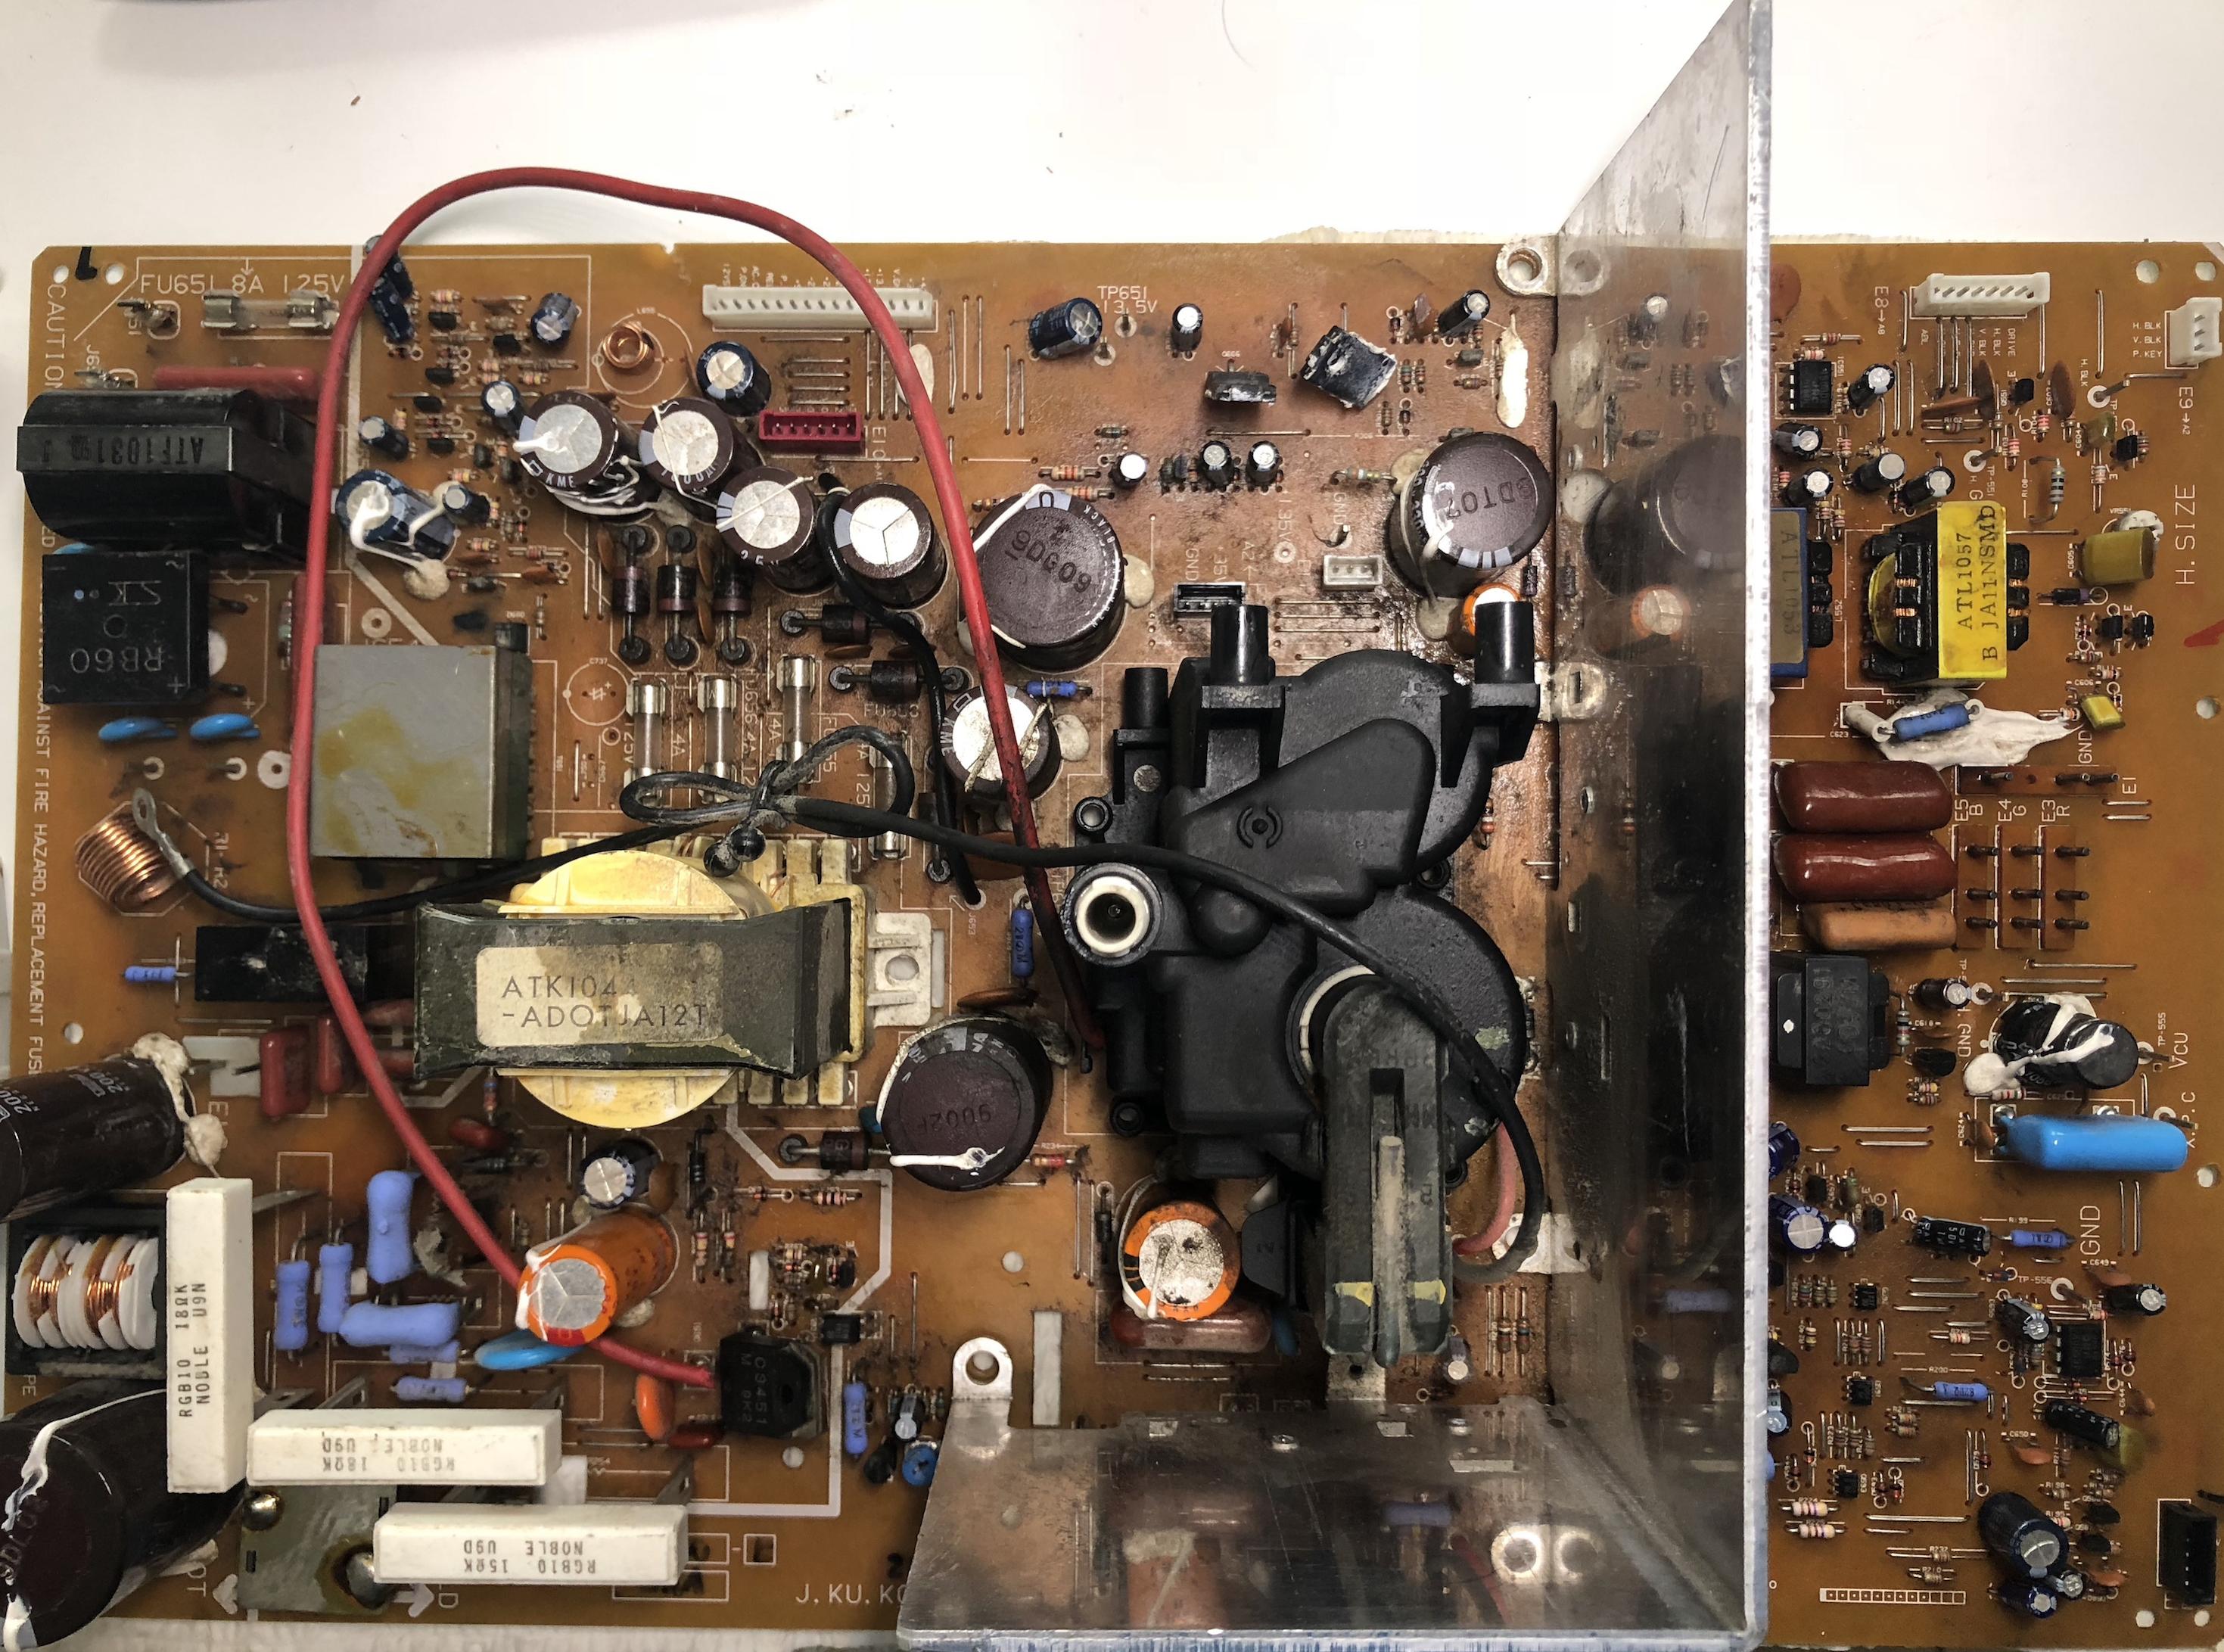 ANPI306-H component side